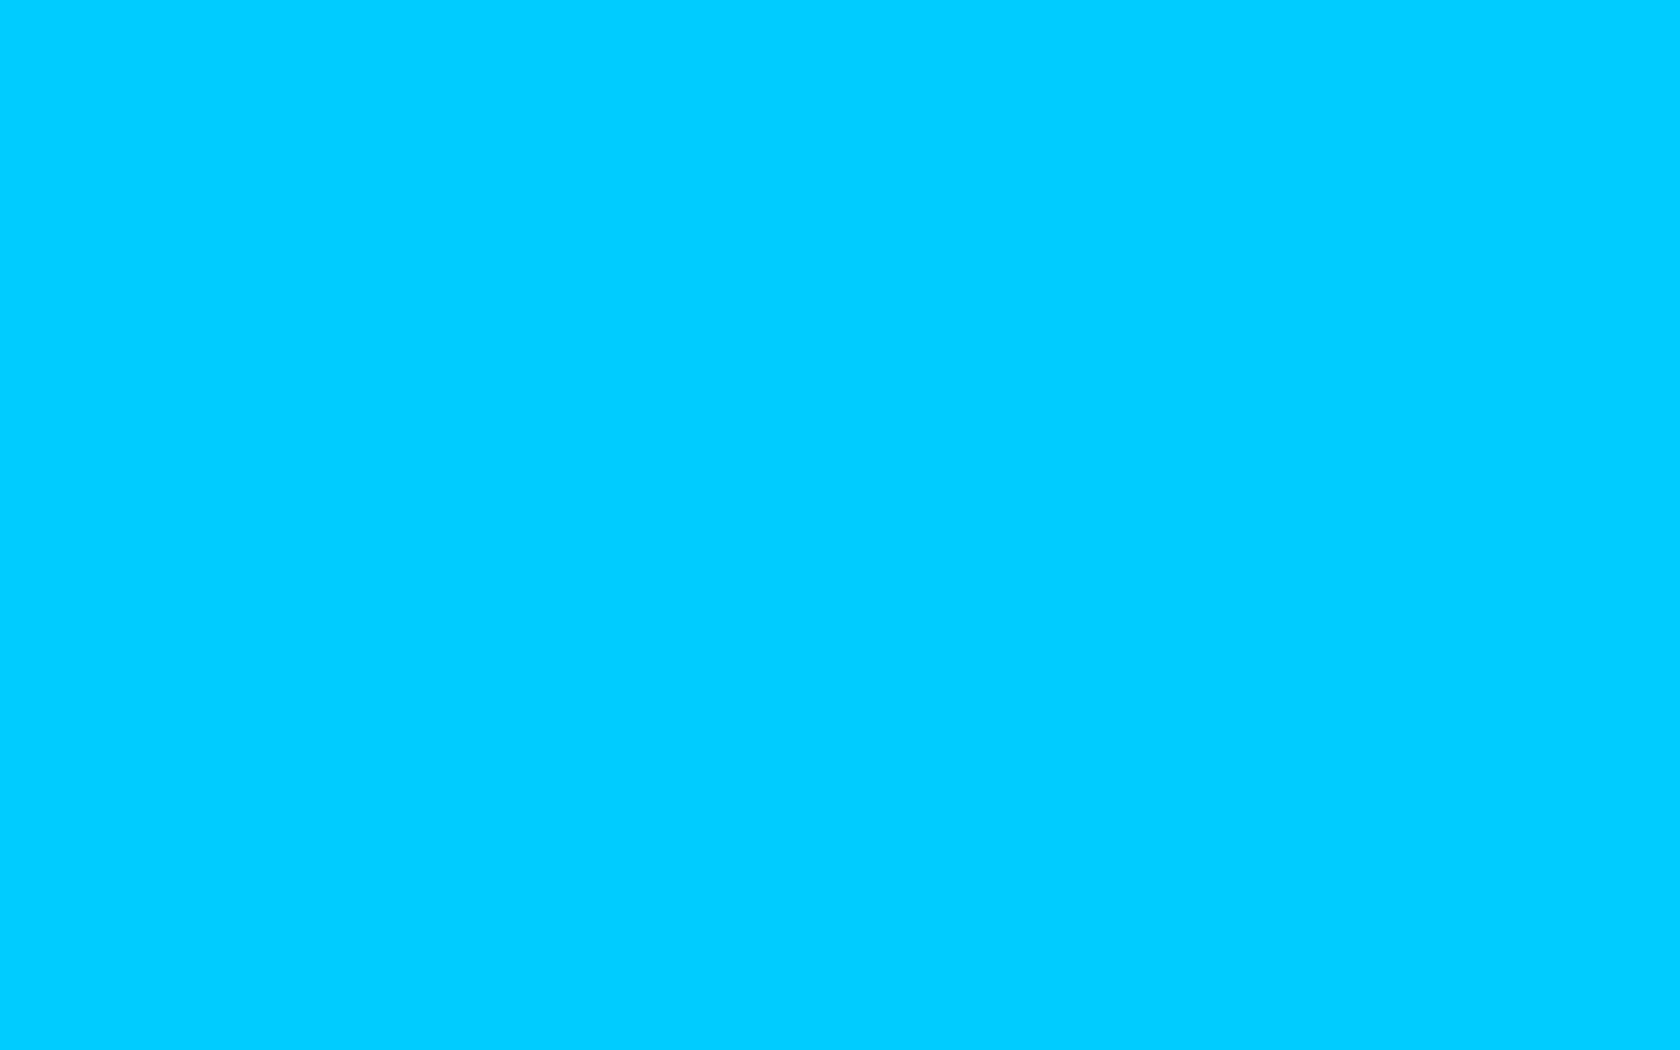 1680x1050 Vivid Sky Blue Solid Color Background